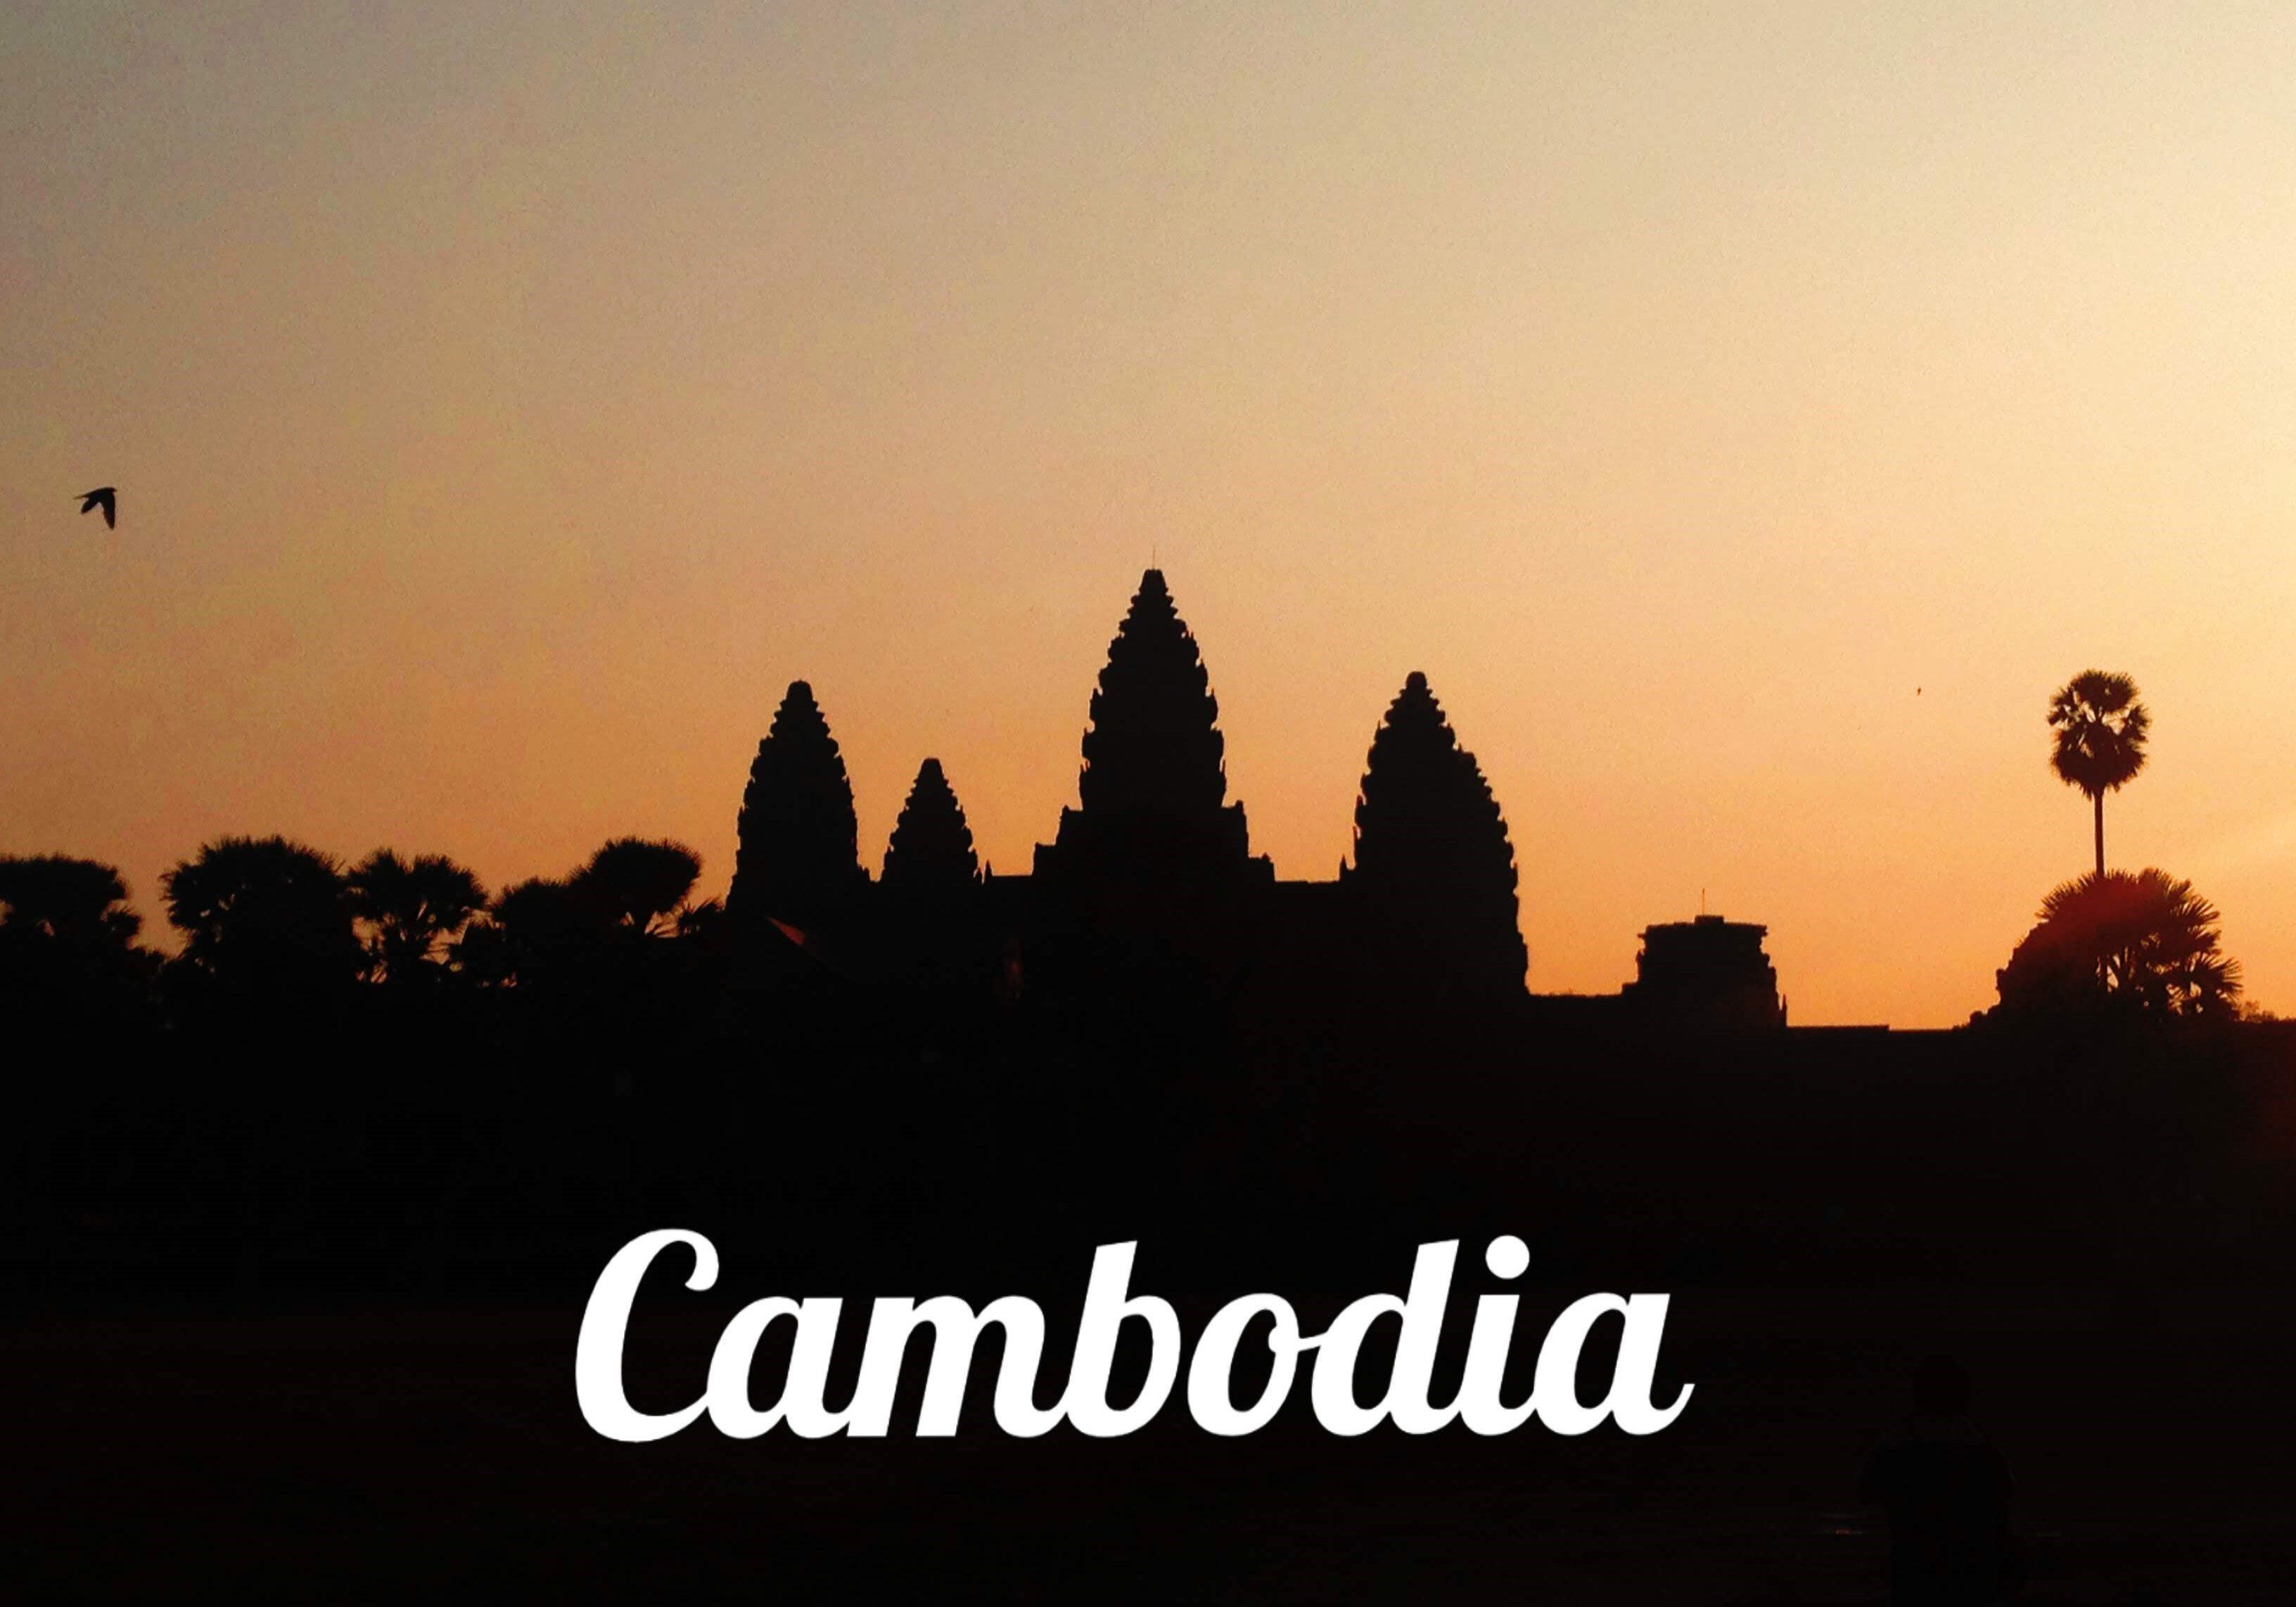 Cambodia, wanderdaze, blog, travelling, travel blog,